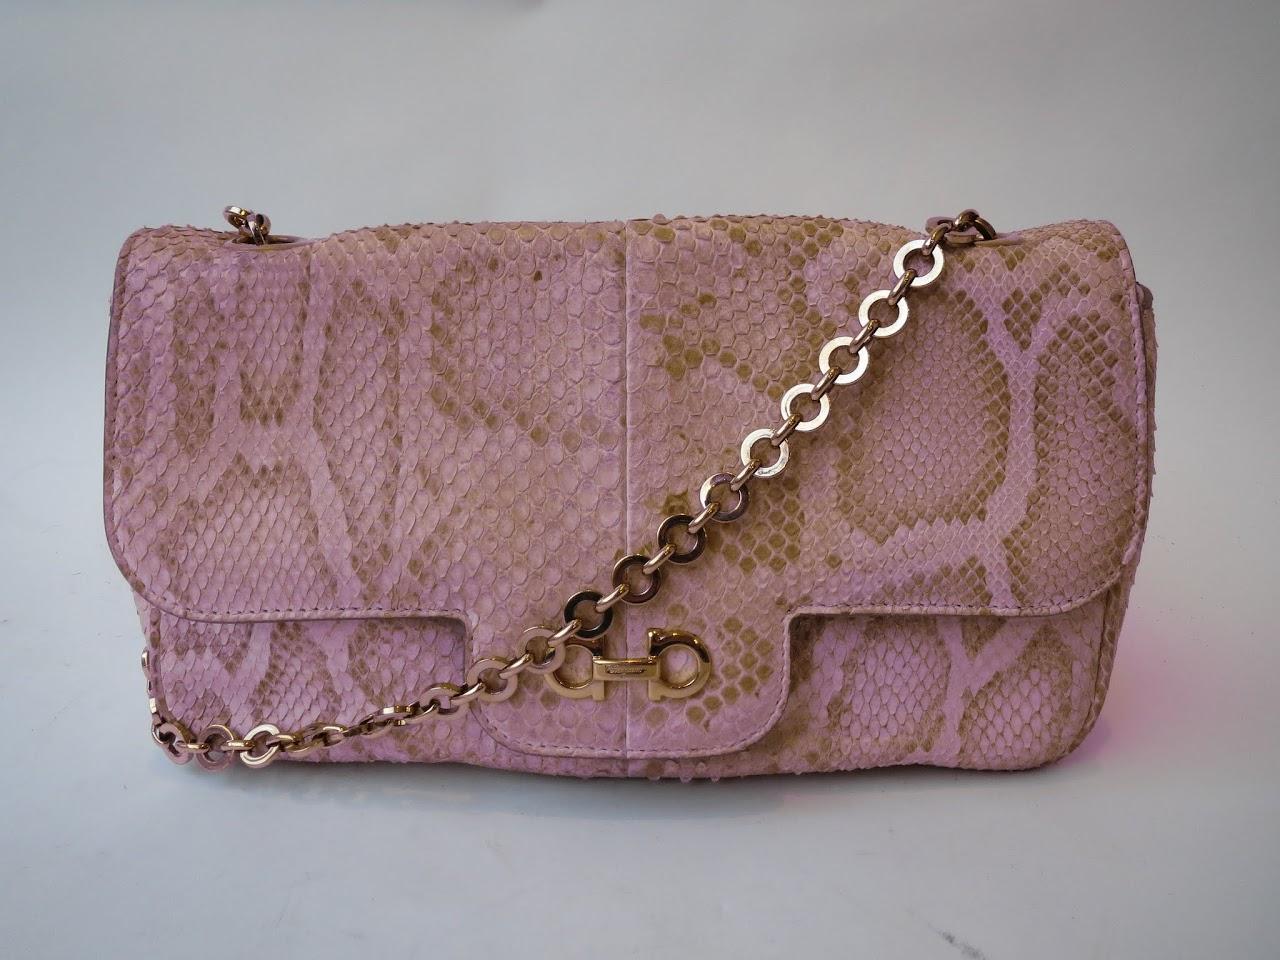 Salvatore Ferragamo Python Handbag